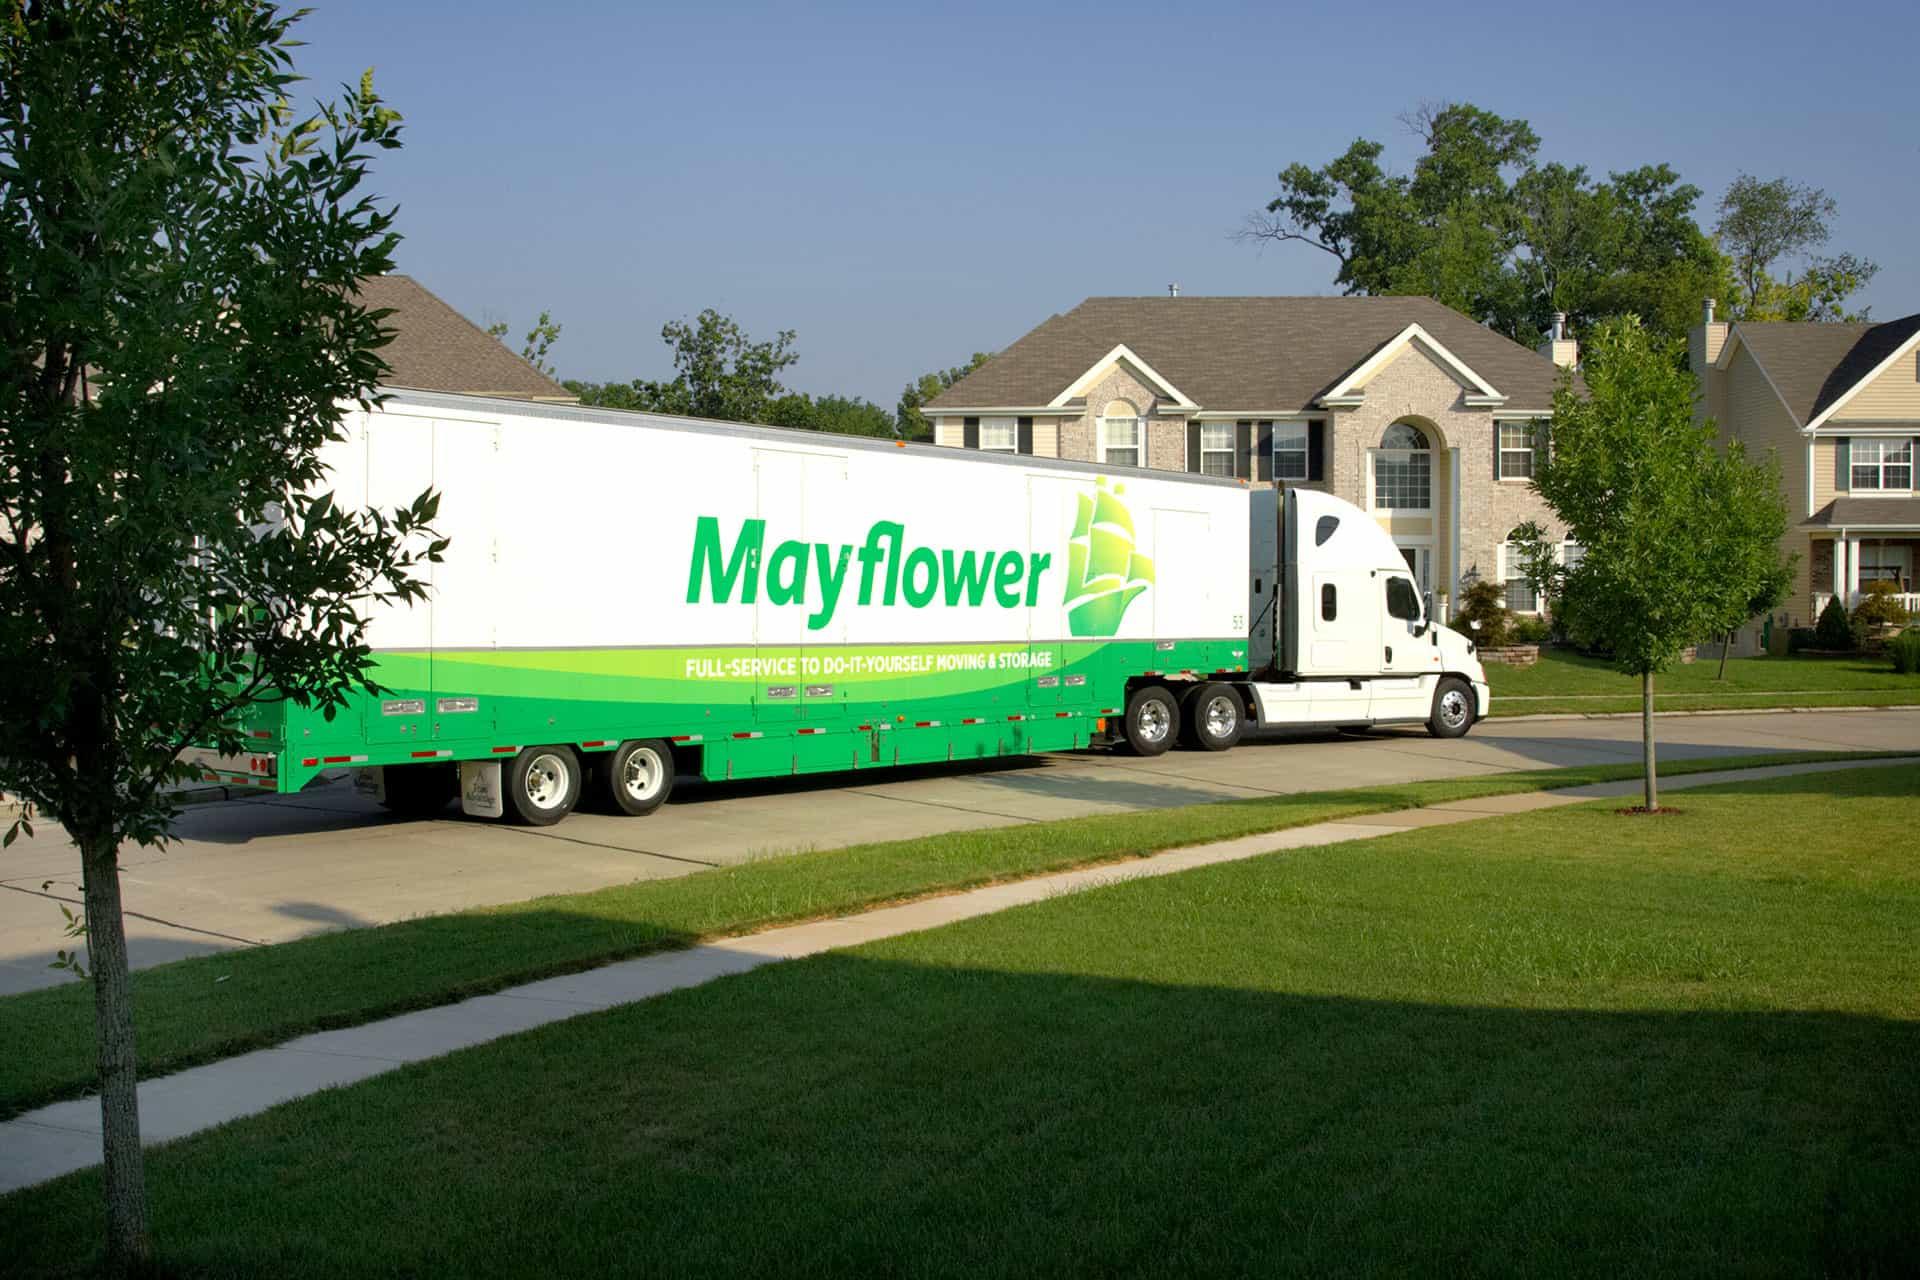 maflower truck near home